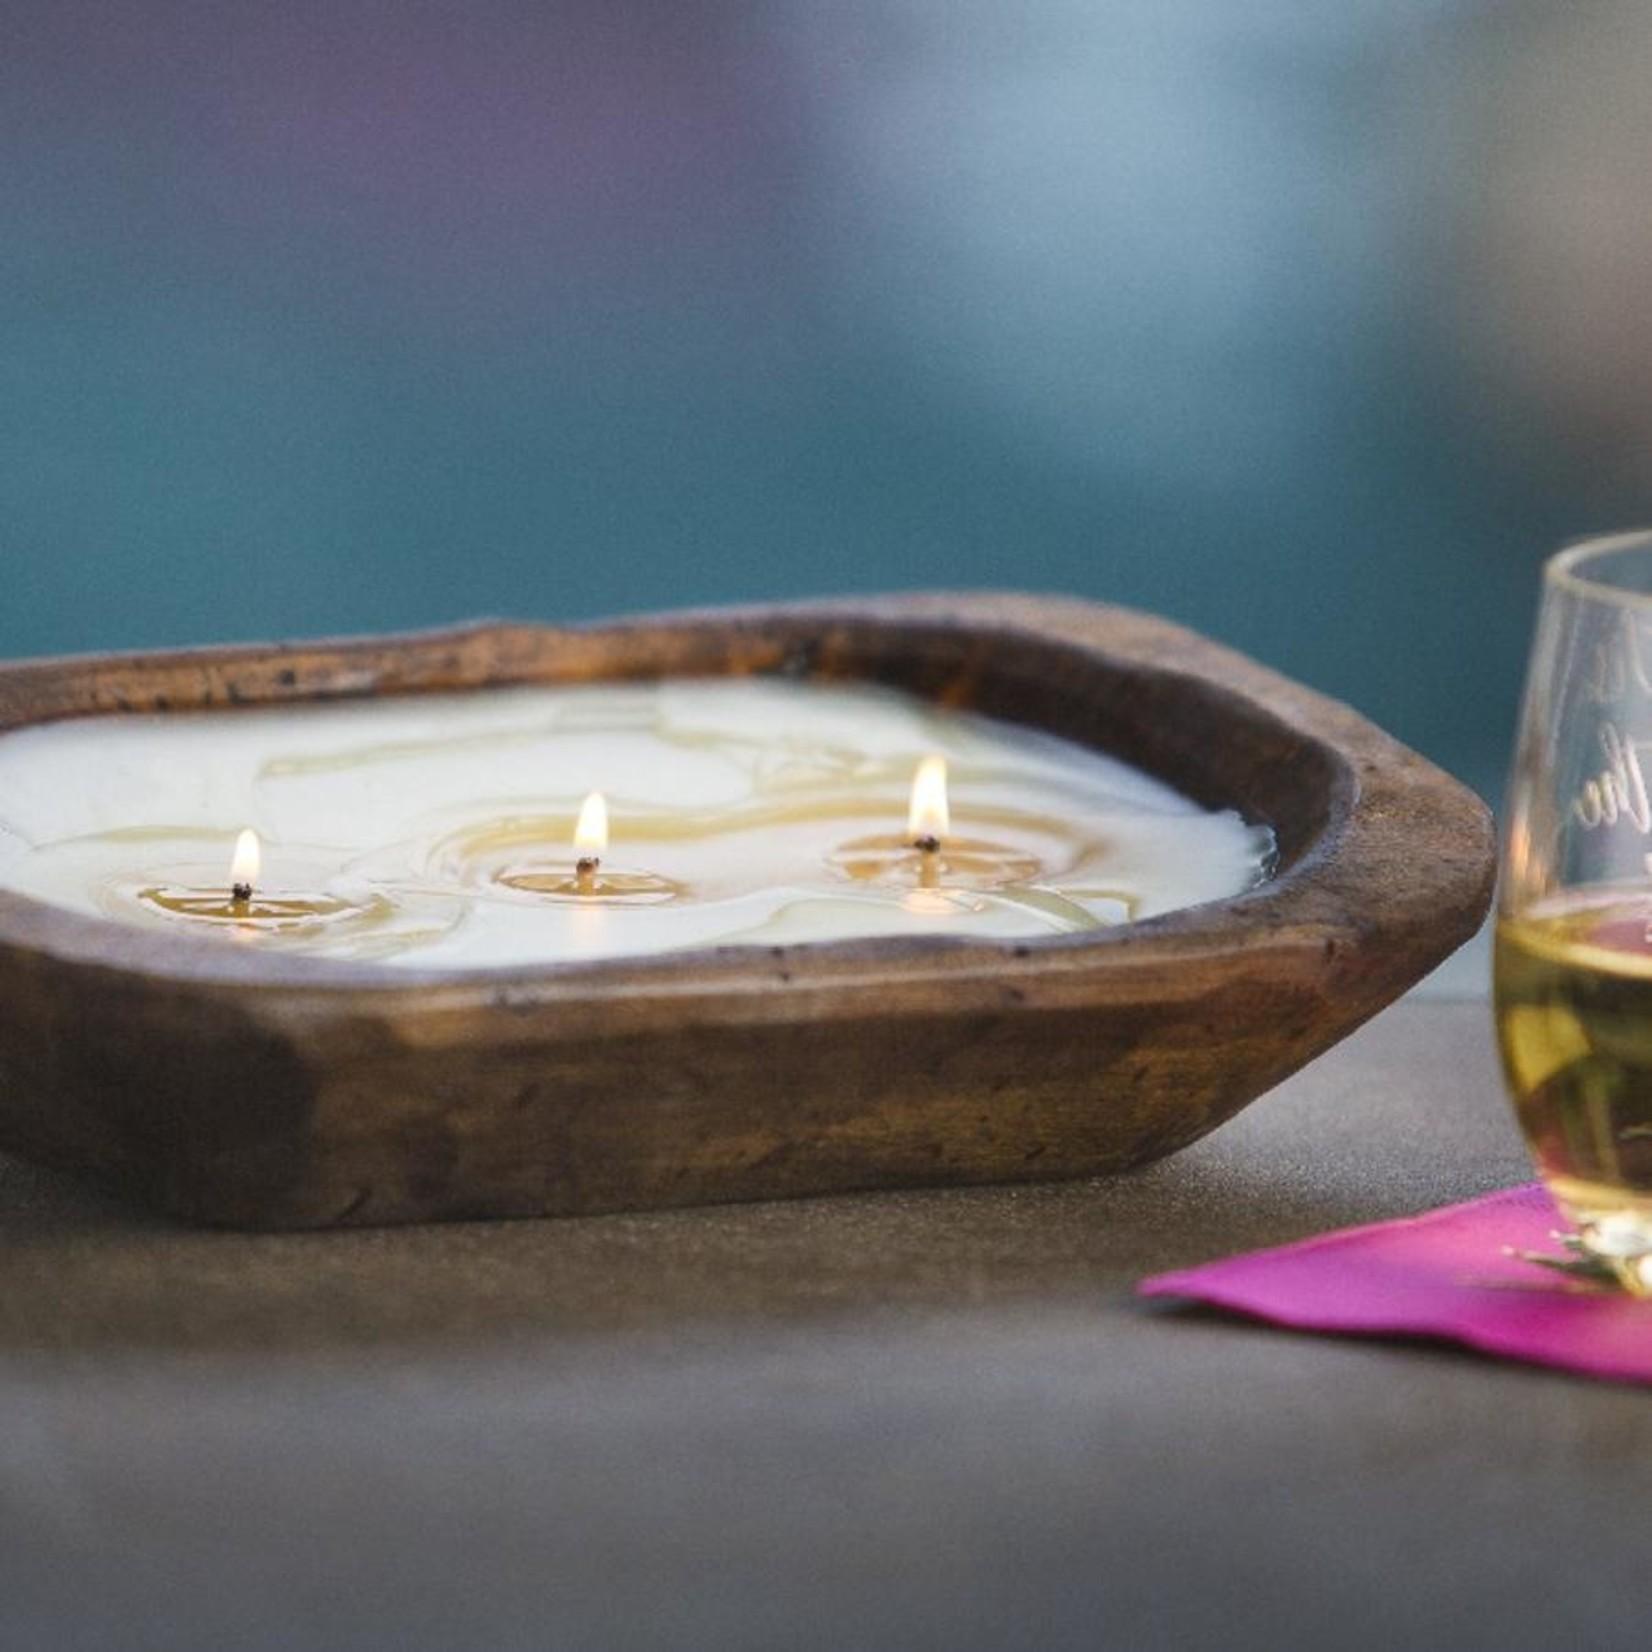 LUX Fragrances Citronella Pineapple - Dough Bowl 3 Wick Candle